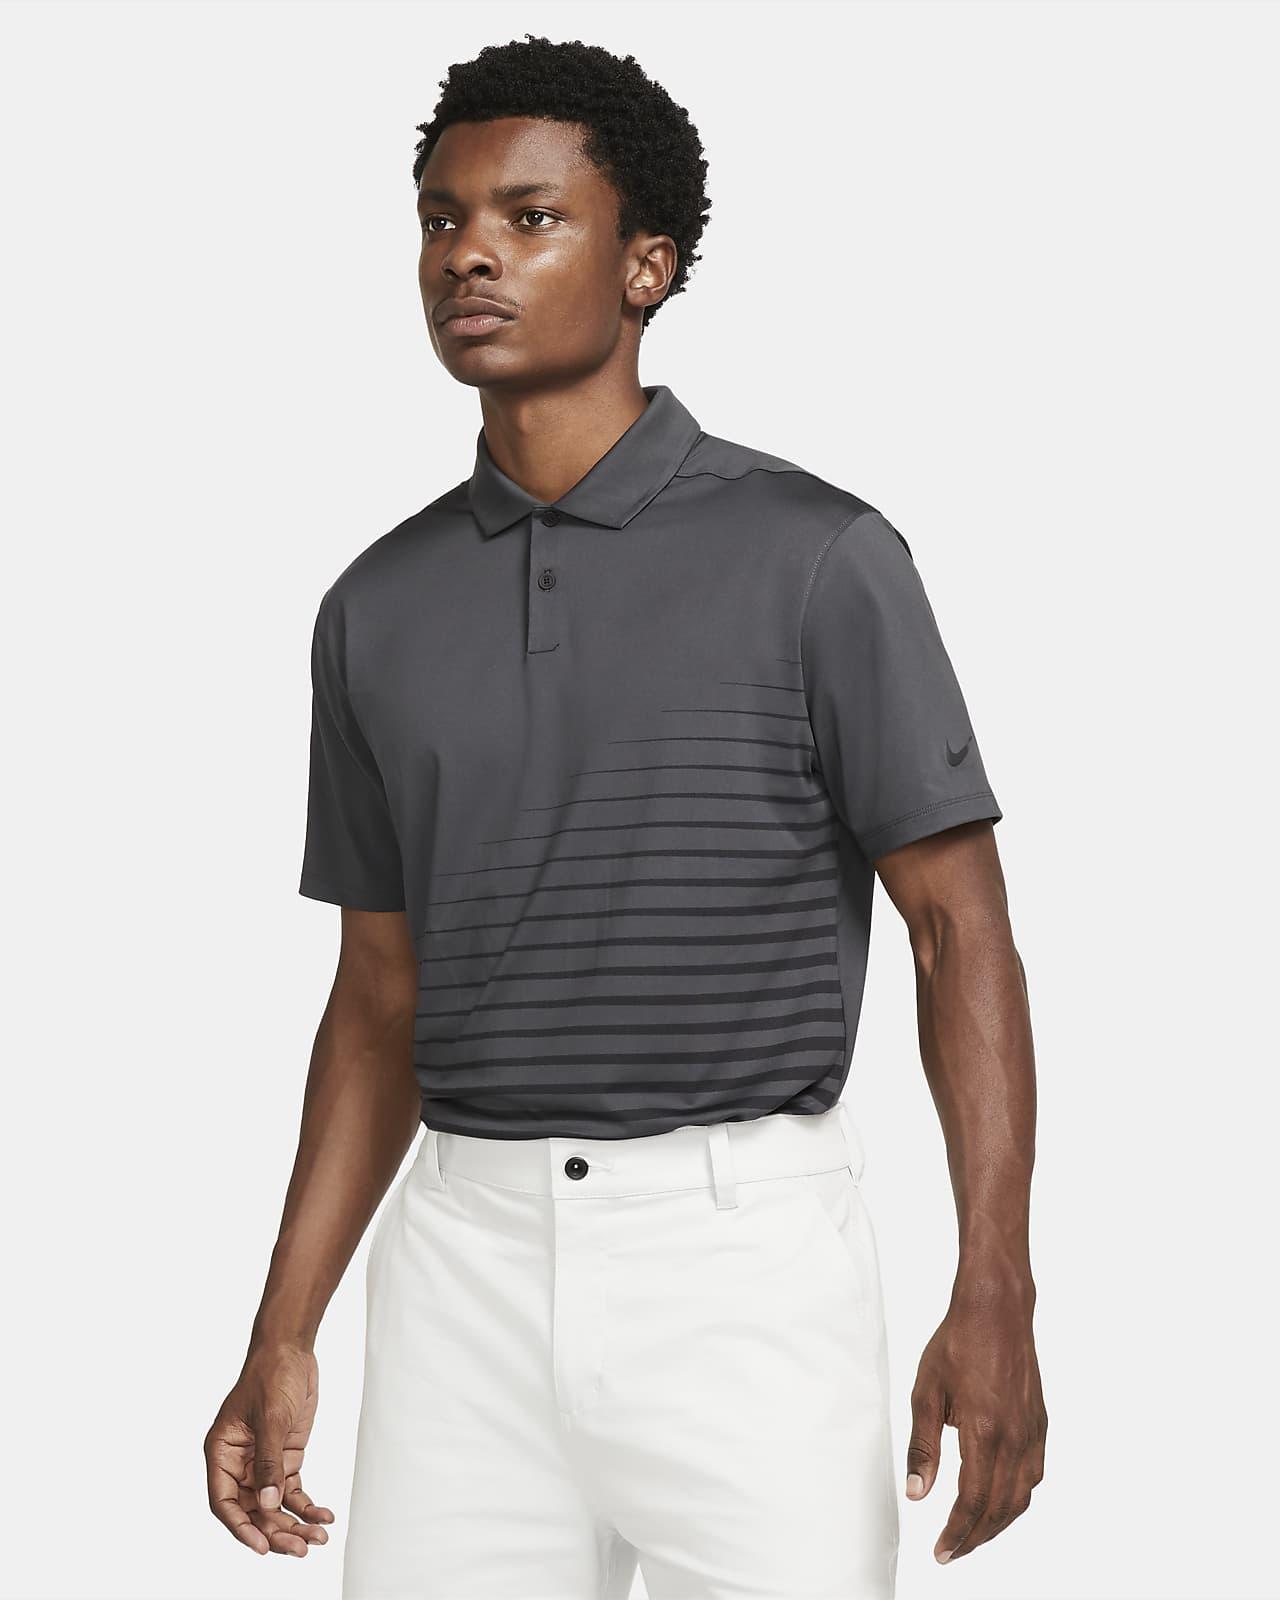 Polo de golf estampado para hombre Nike Dri-FIT Vapor